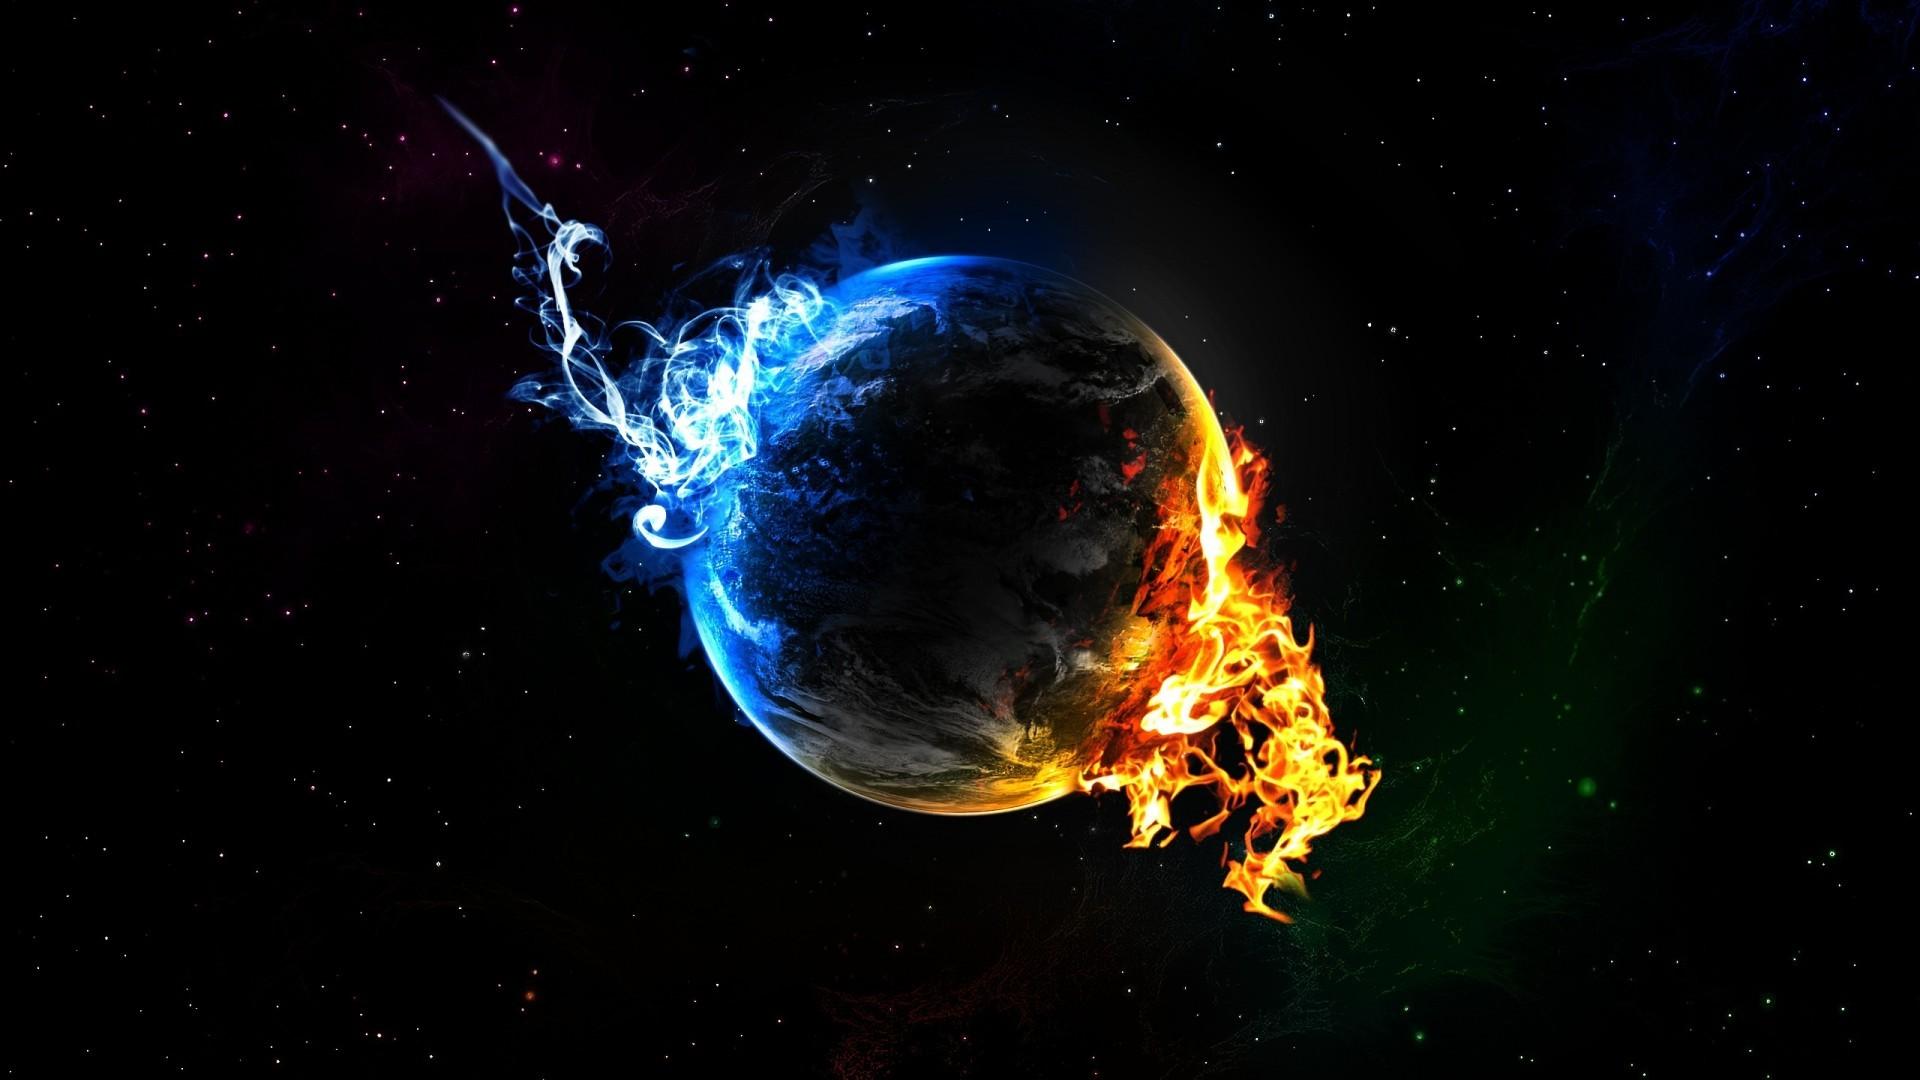 Wallpapers HD earth on fire.